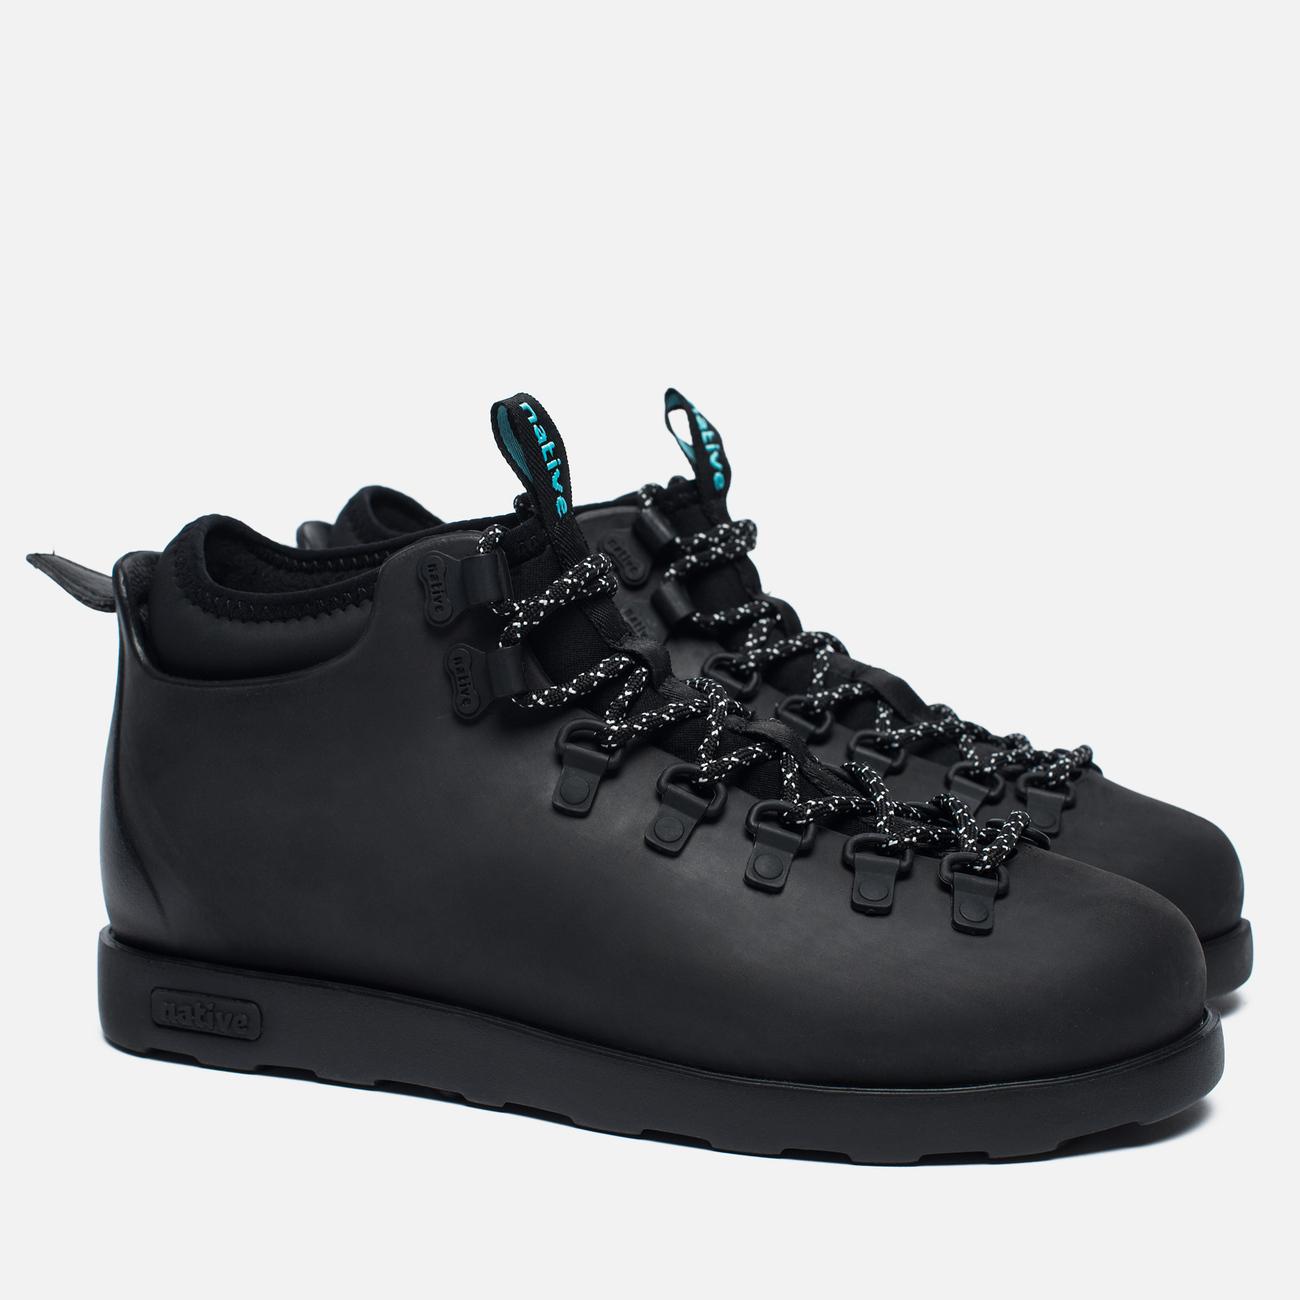 Ботинки Native Fitzsimmons Jiffy Black/Jiffy Black